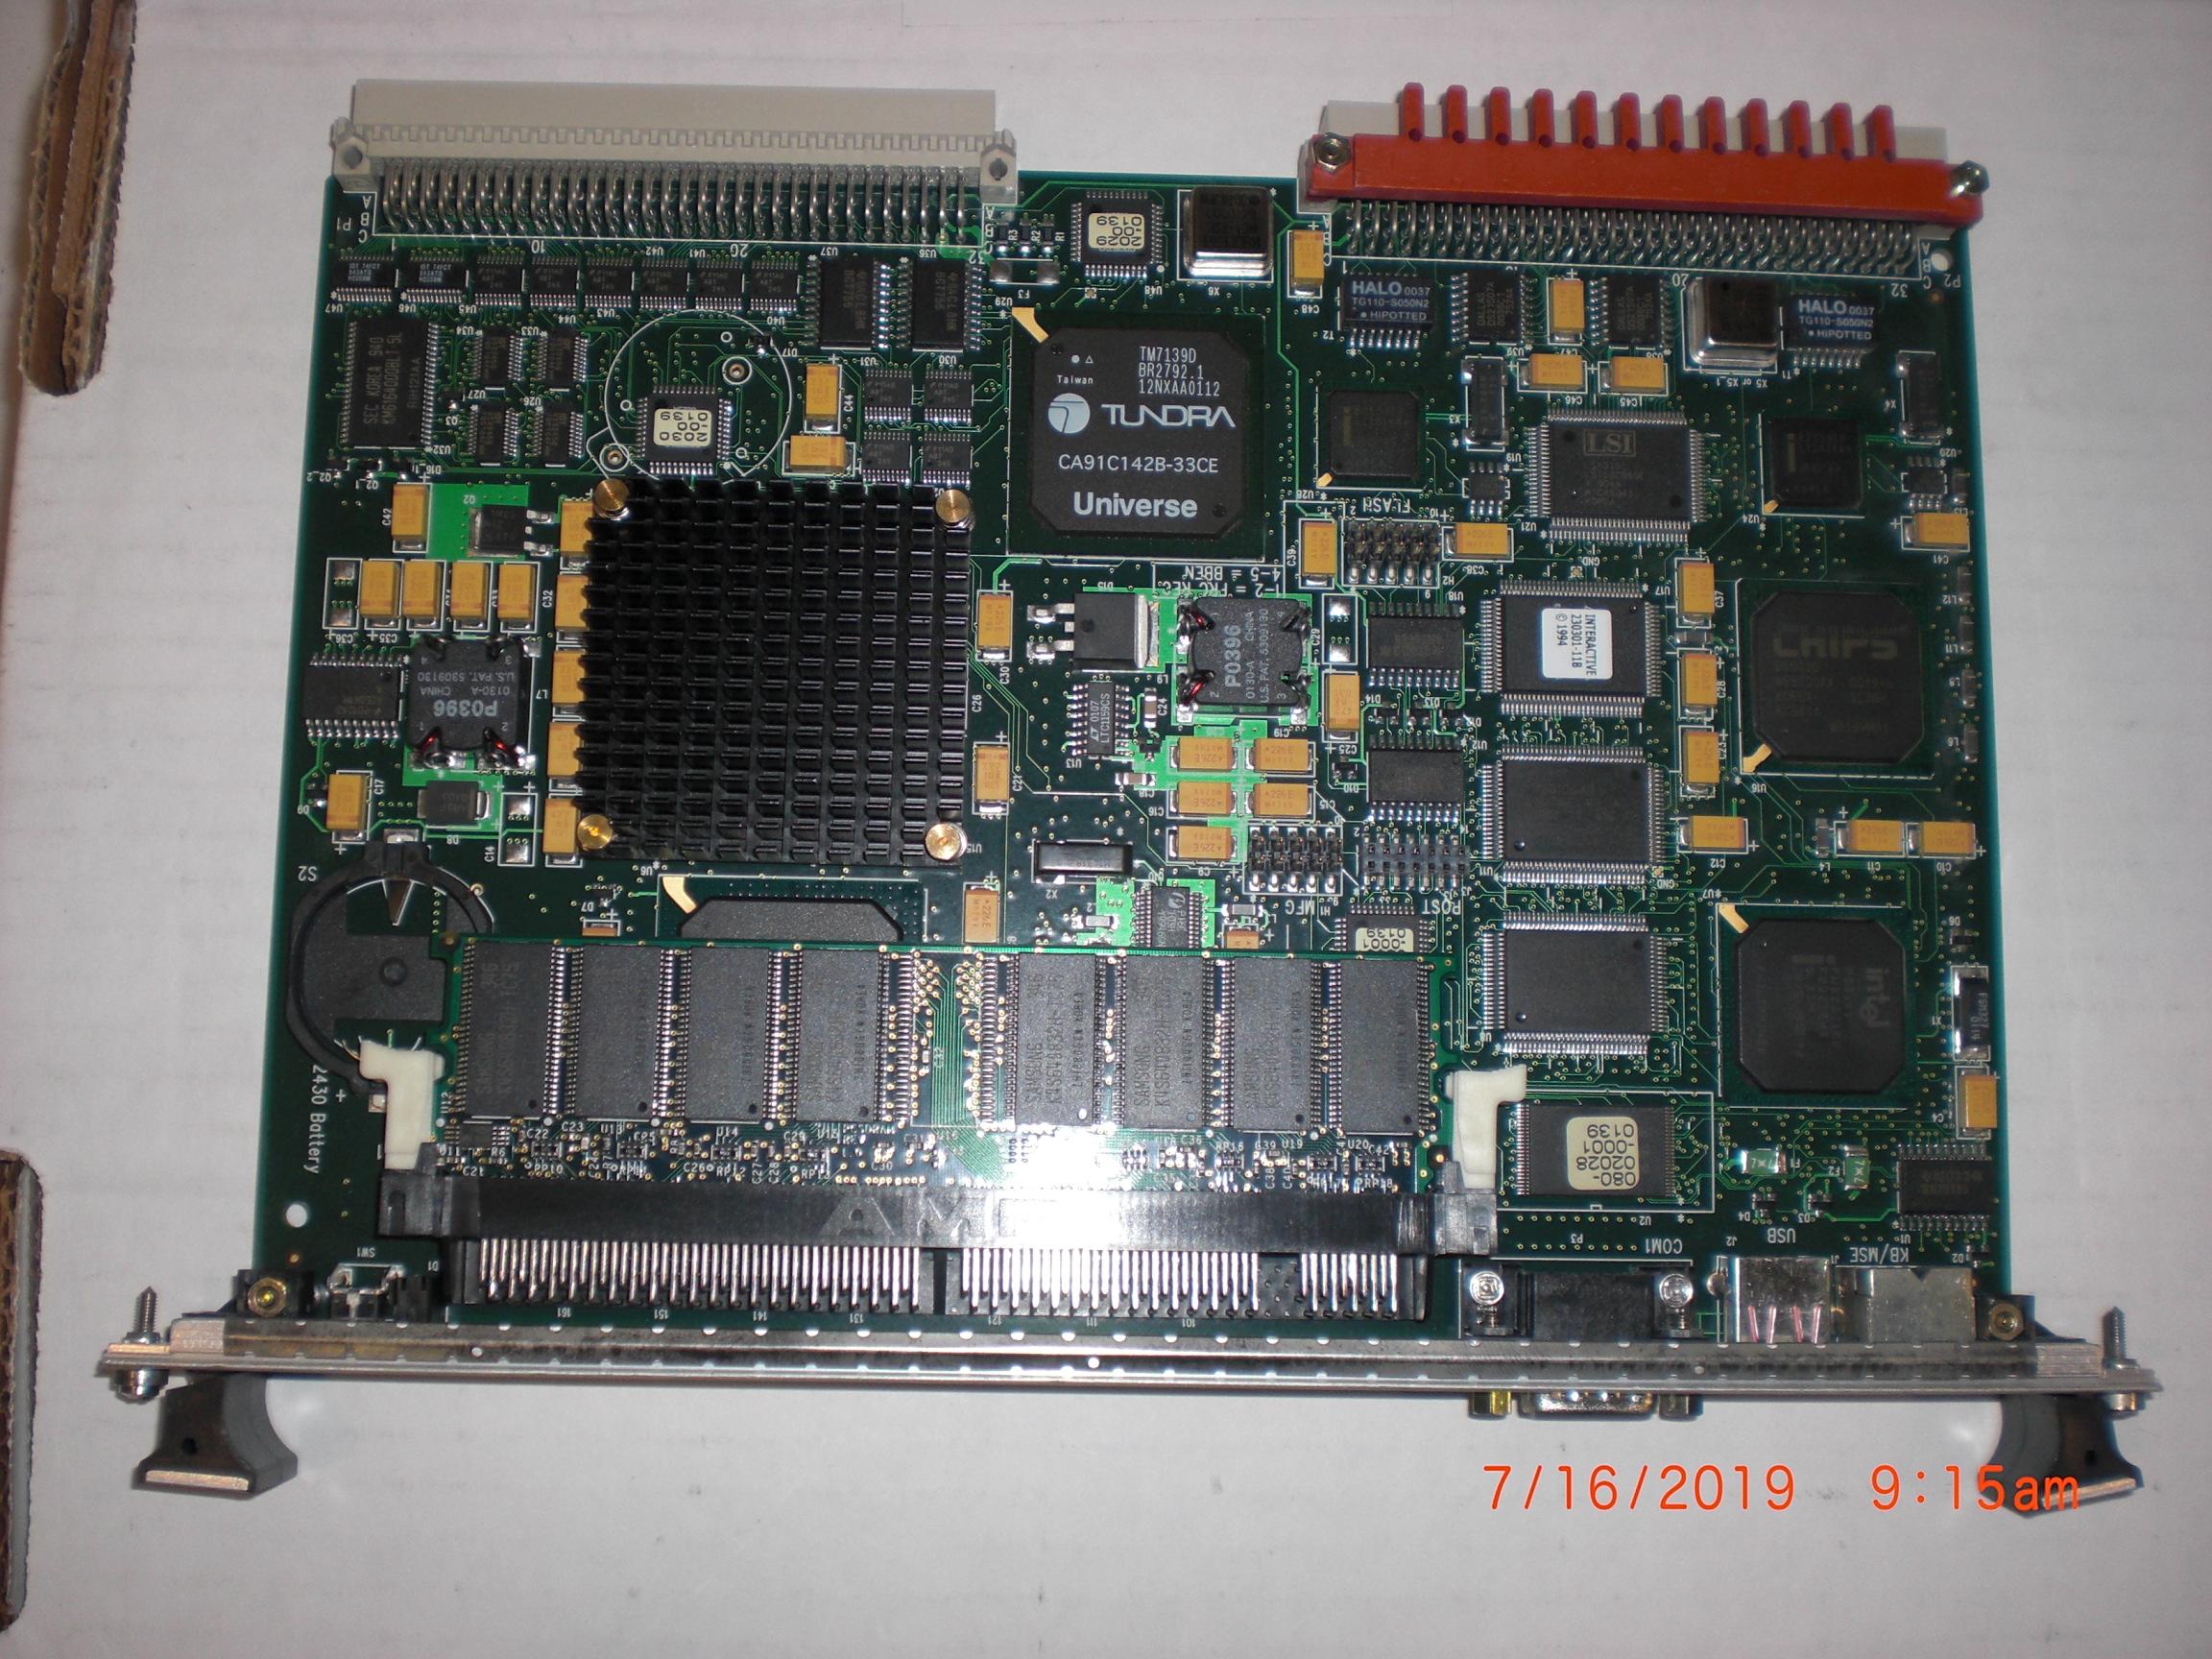 PCB Applied Materials (AMAT) 0660-00032 VME PIII 400MHZ SINGLE SLOT  DUAL ENET